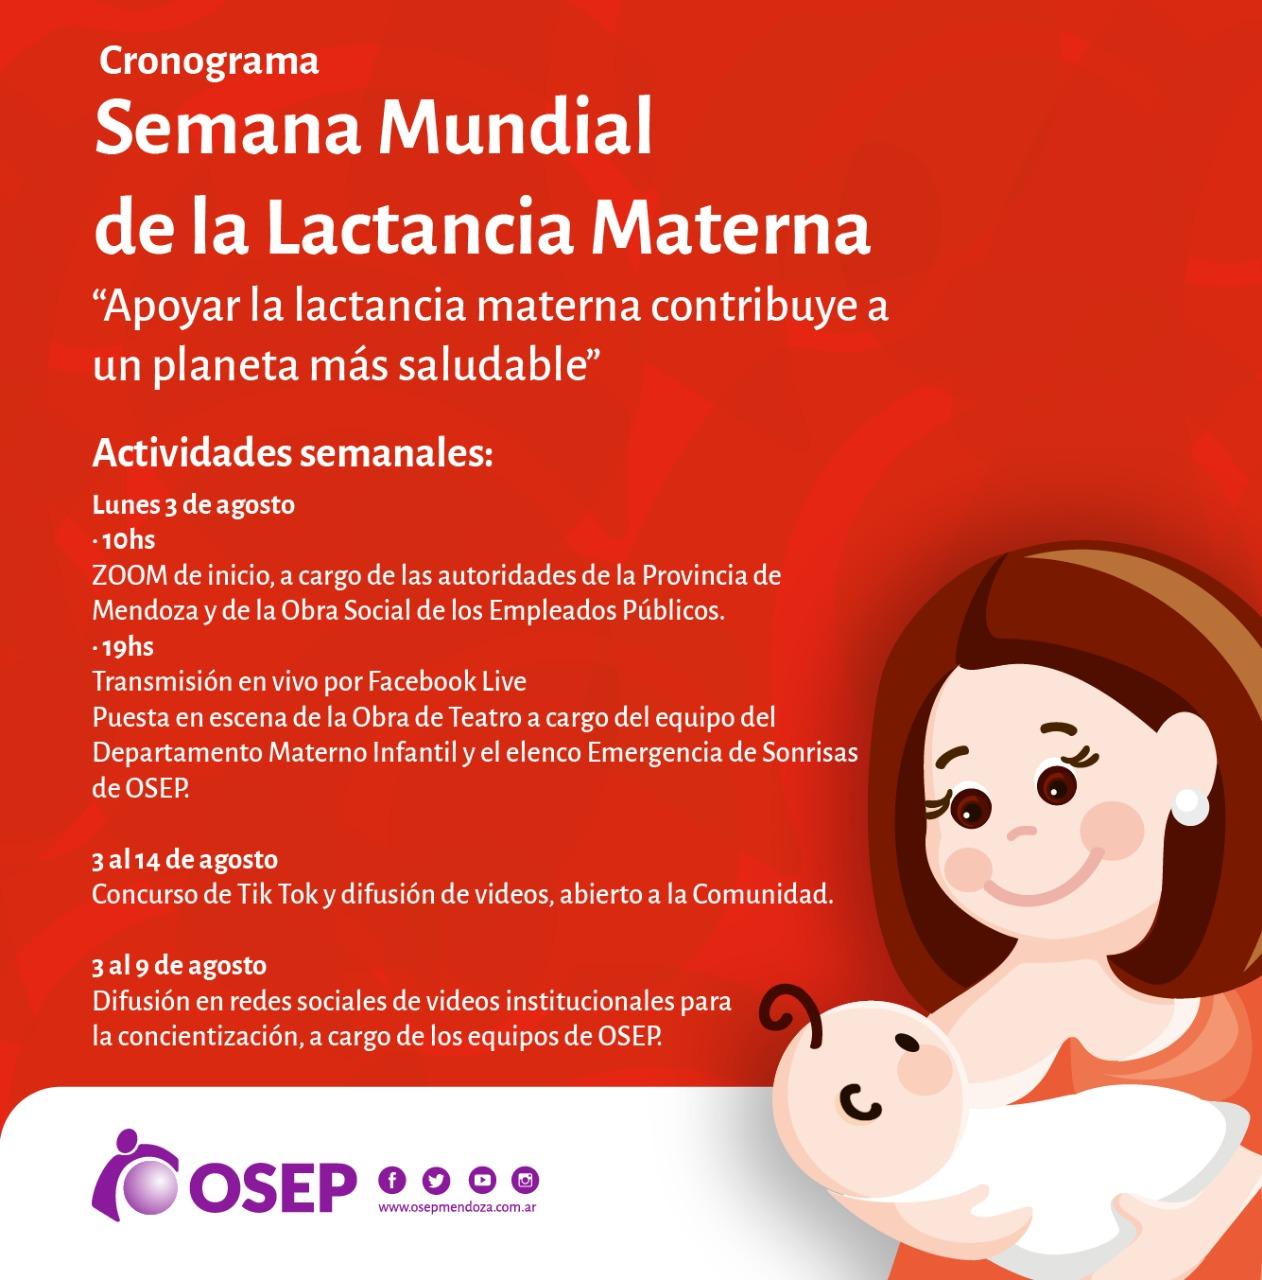 Semana de la lactancia materna - Diario San Rafael